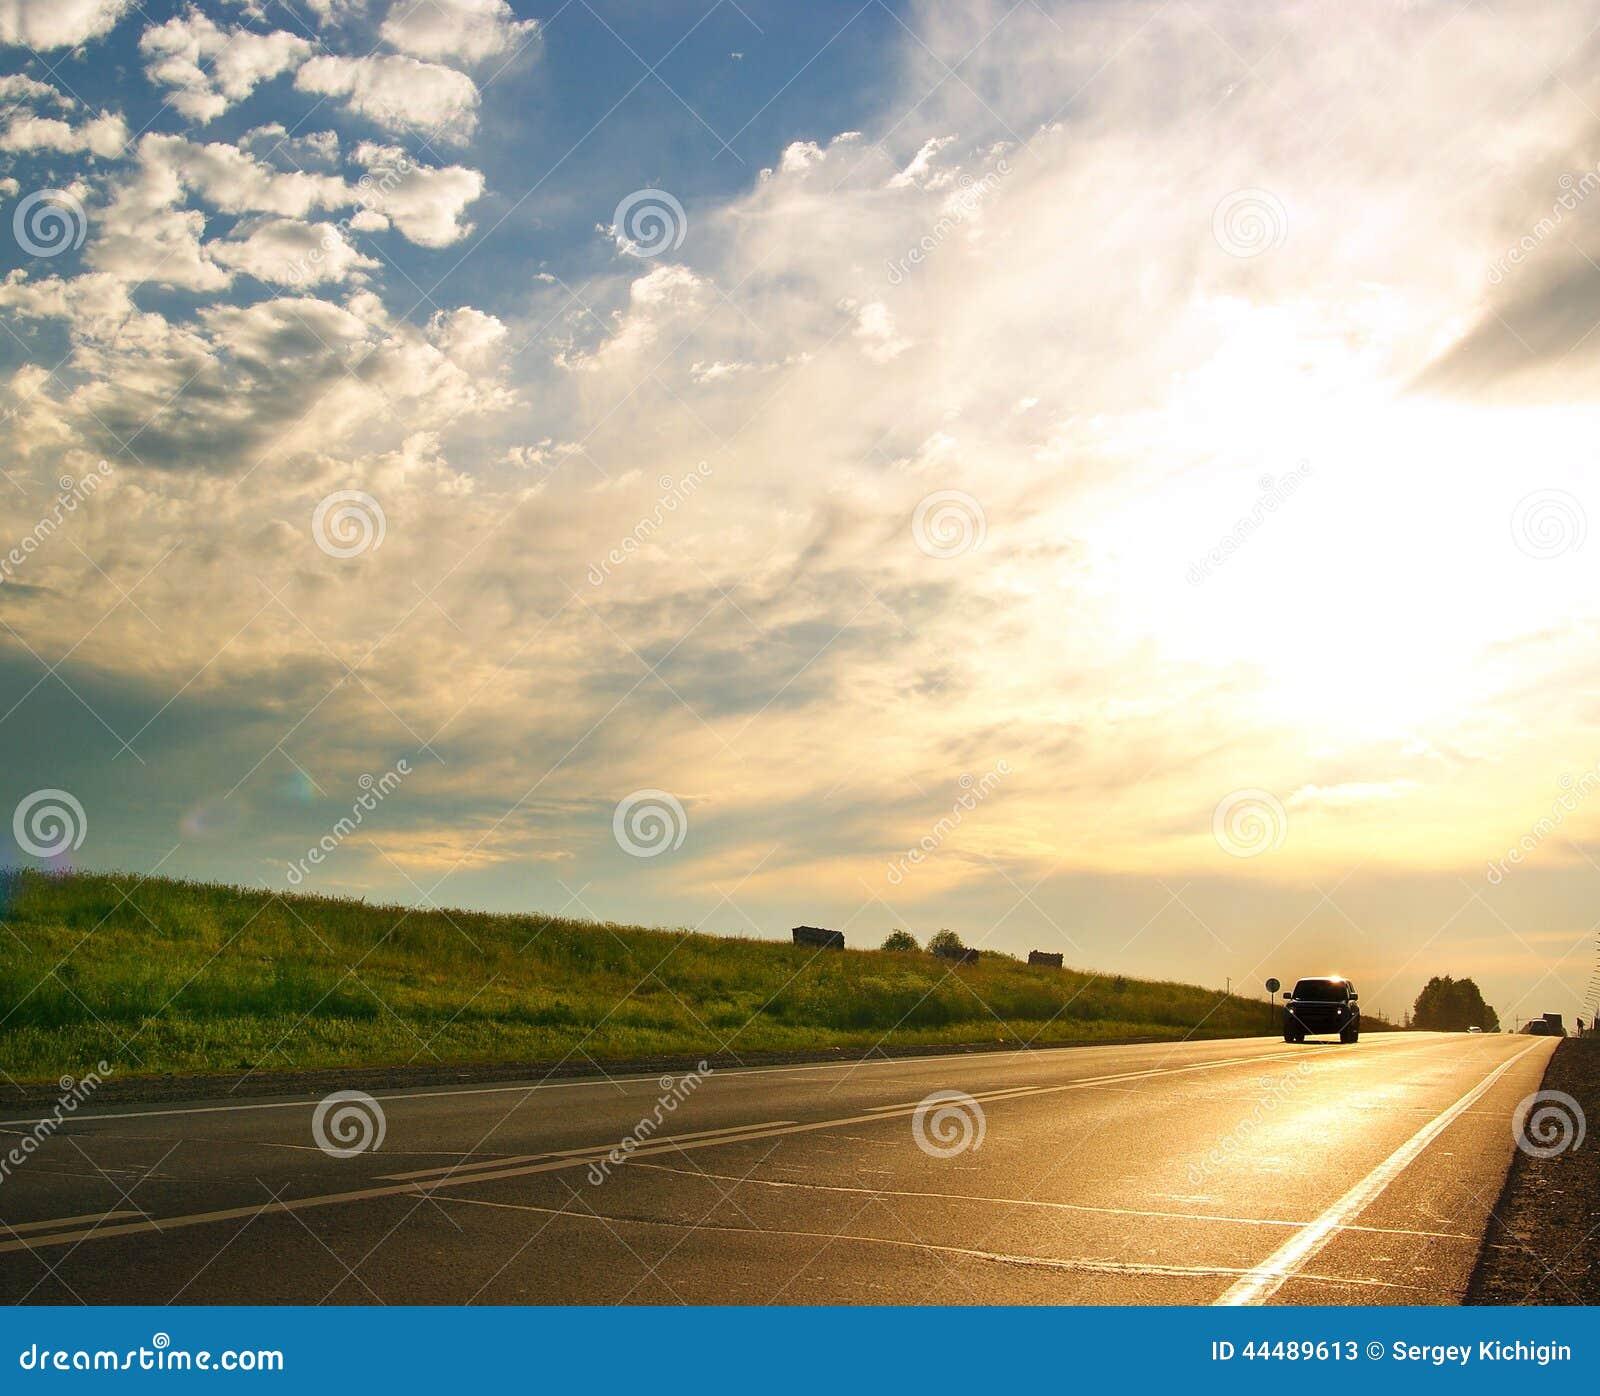 Golden road route blur truck